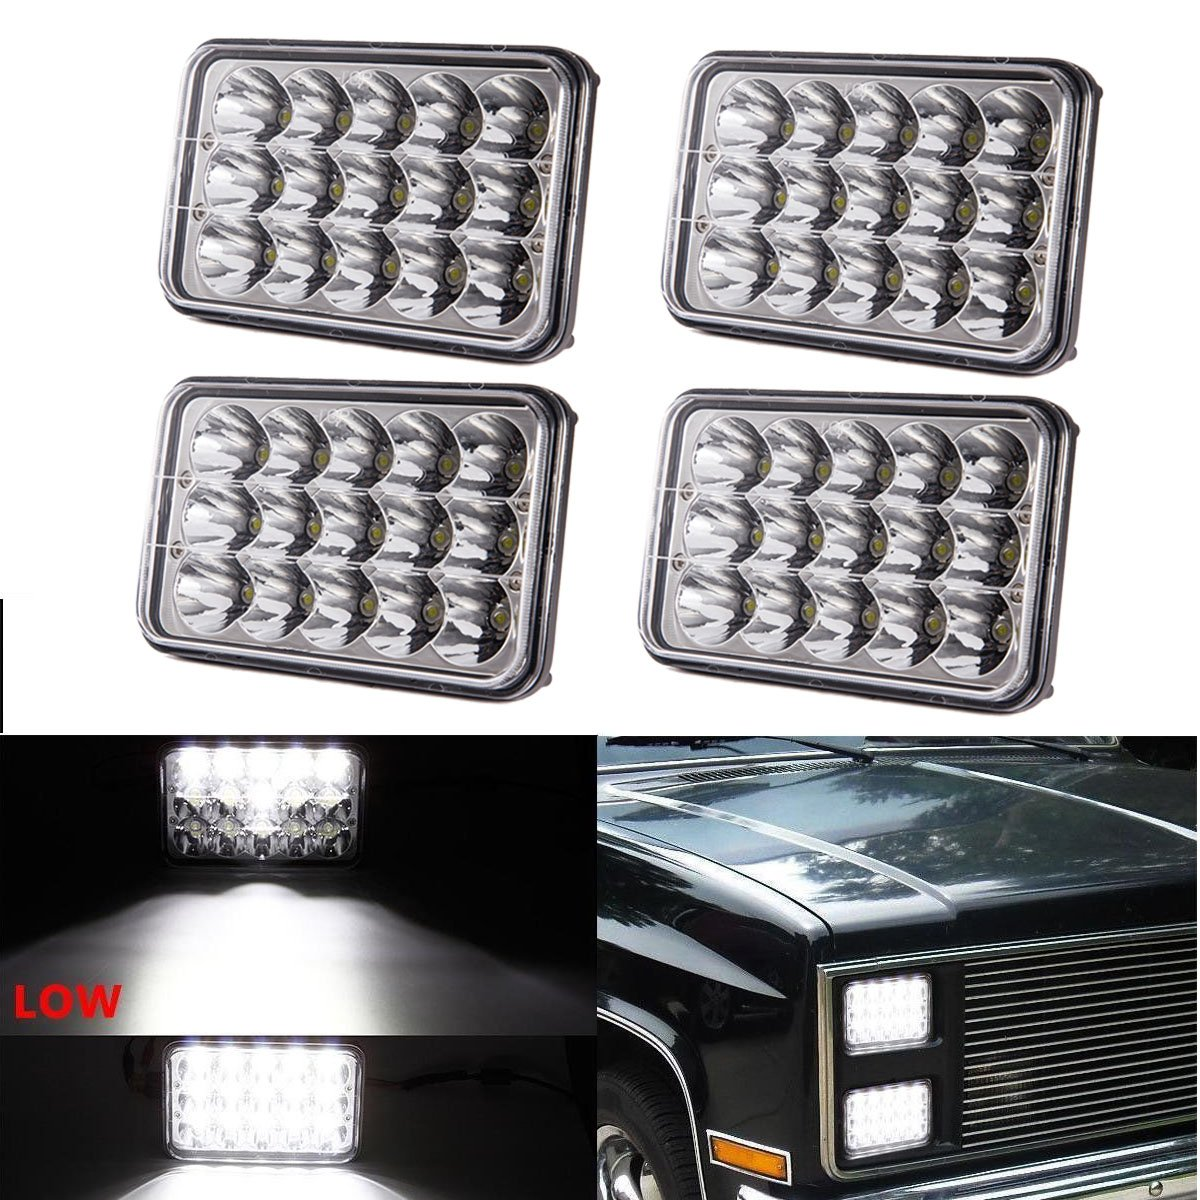 All Chevy 95 chevy headlights : Amazon.com: Headlight Assemblies - Headlight Assemblies ...